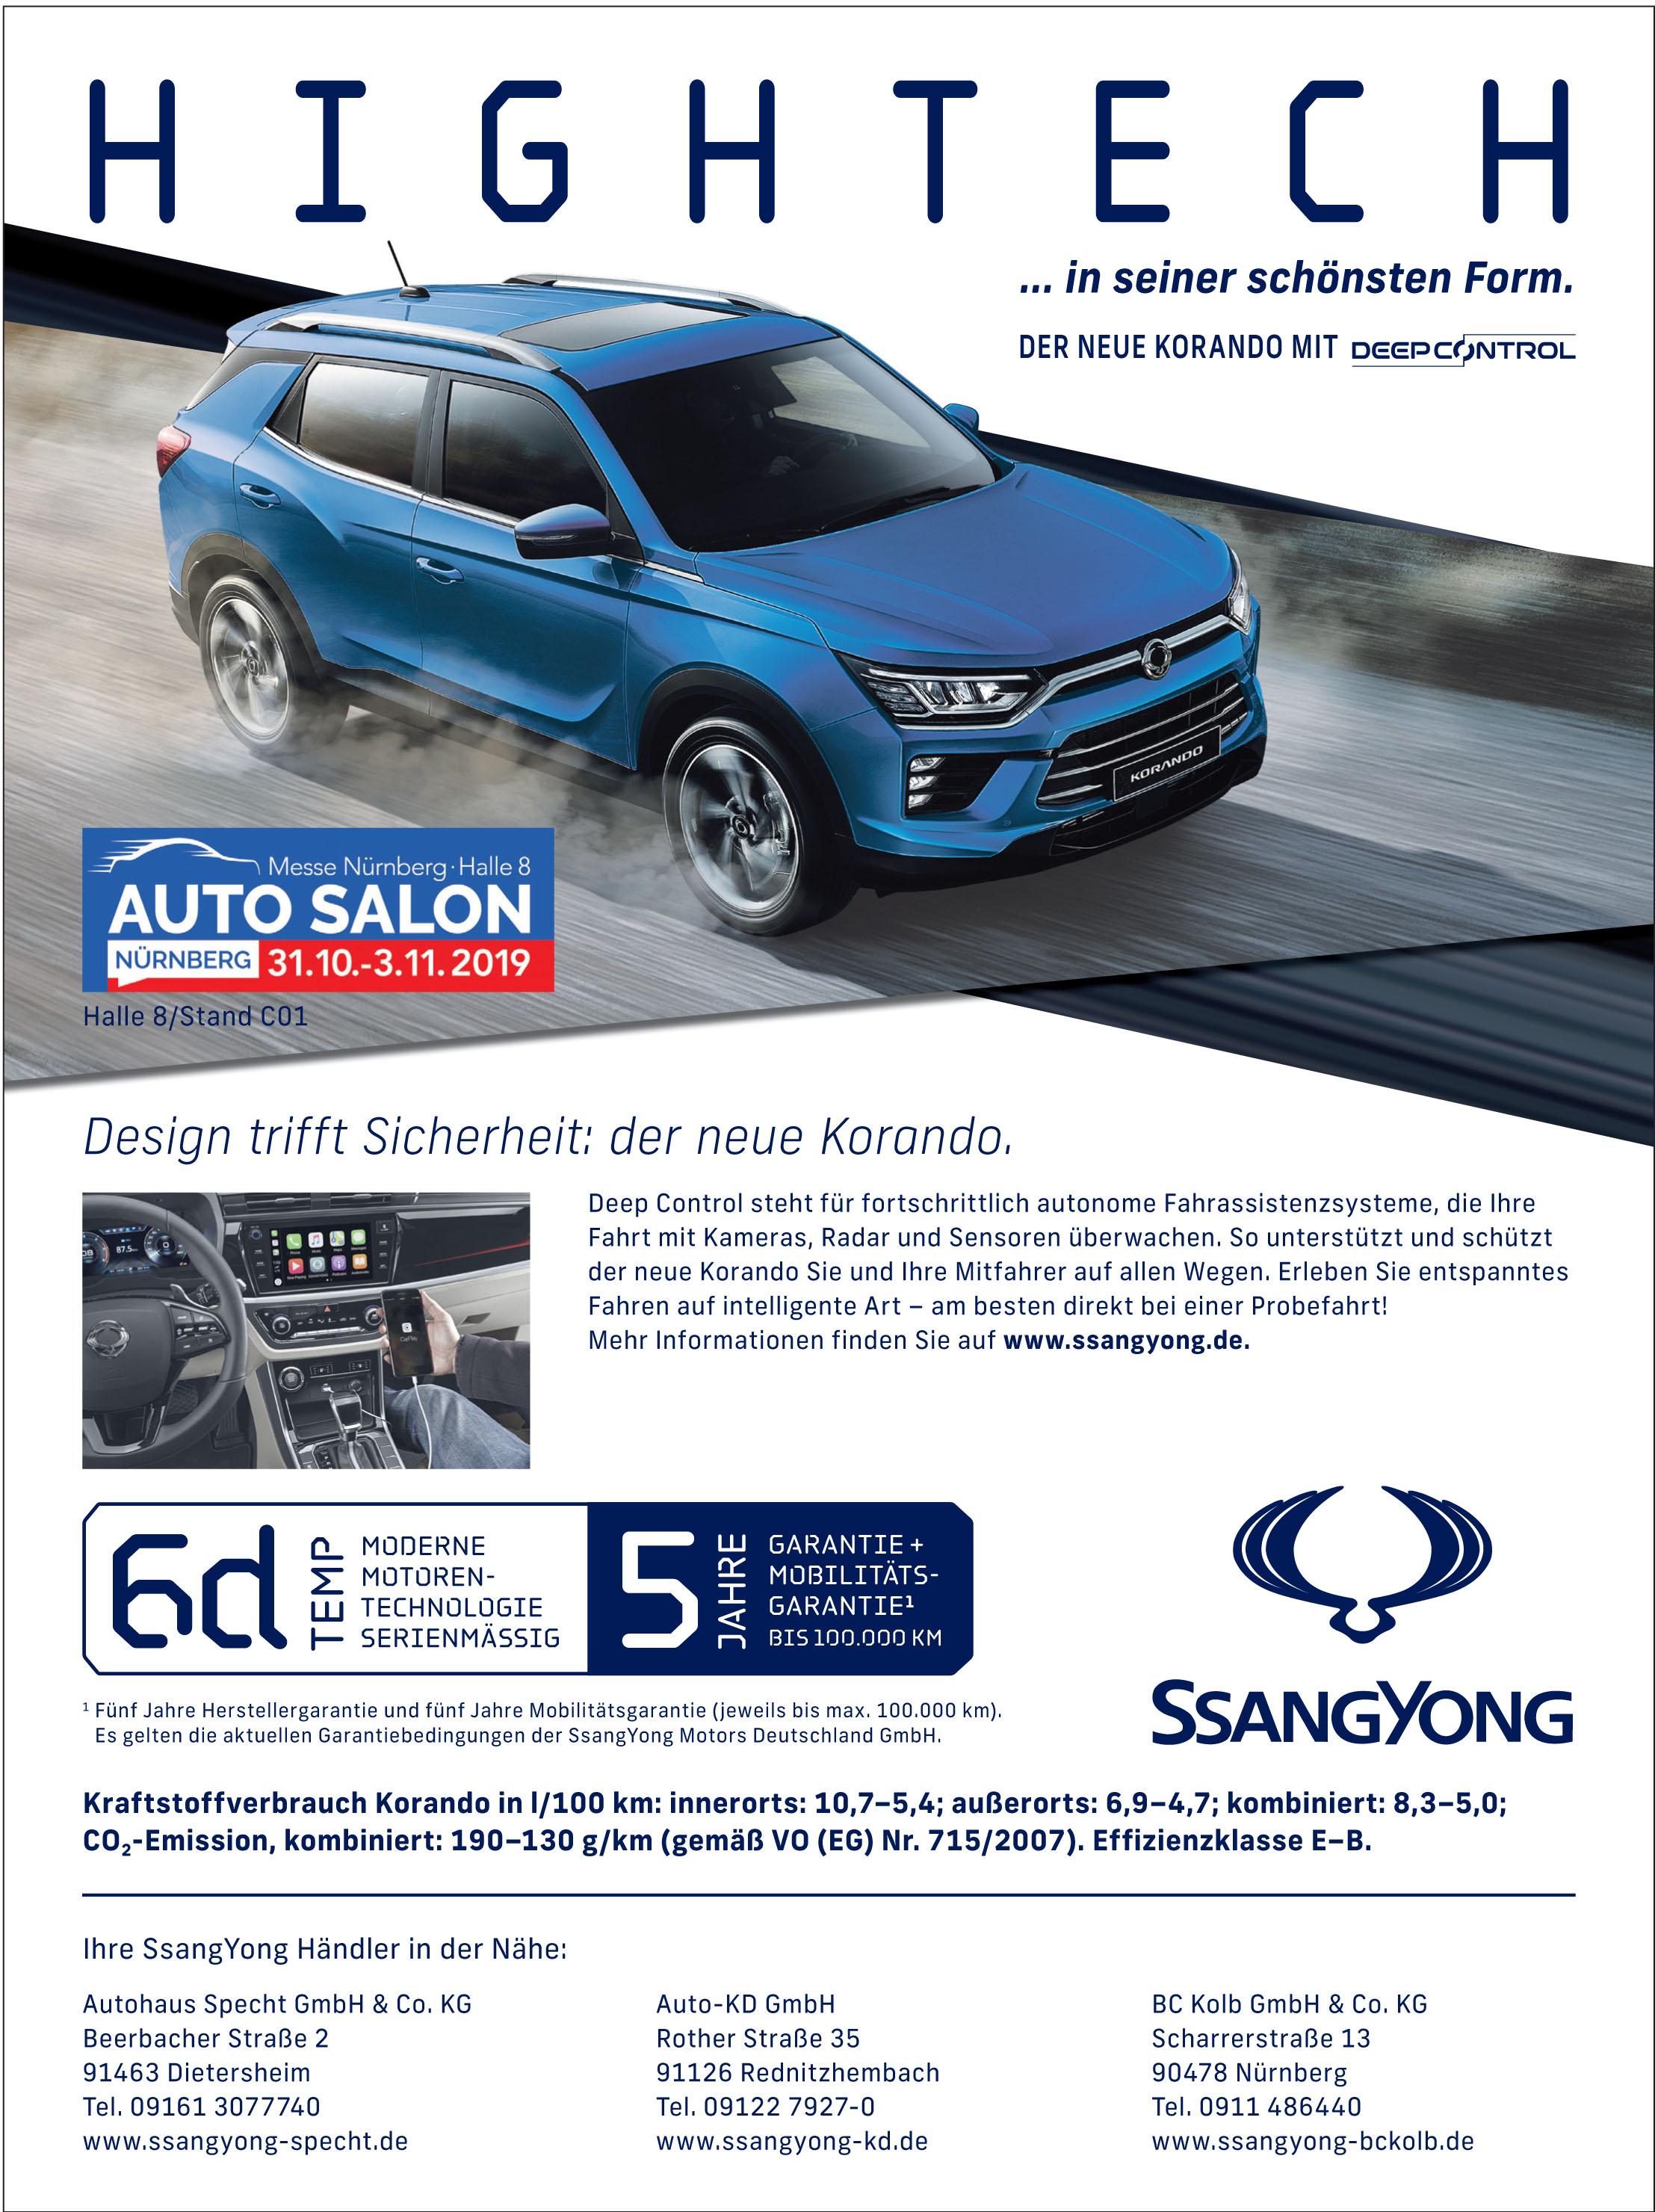 Ssangyong Motors Deutschland GmbH